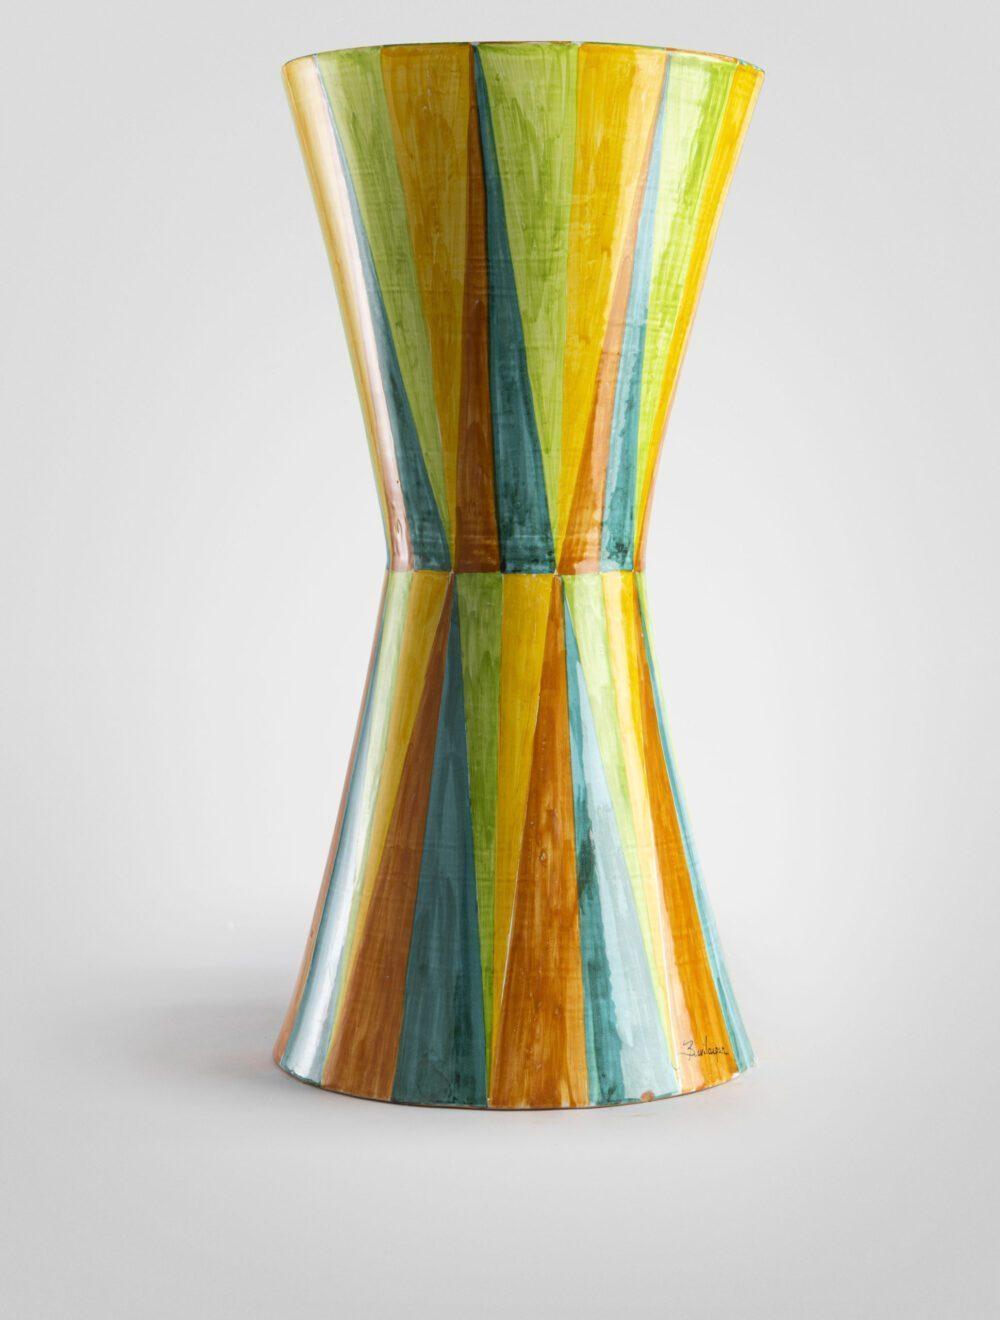 Saraceno tavolo geometrico decoro a rombi lucido